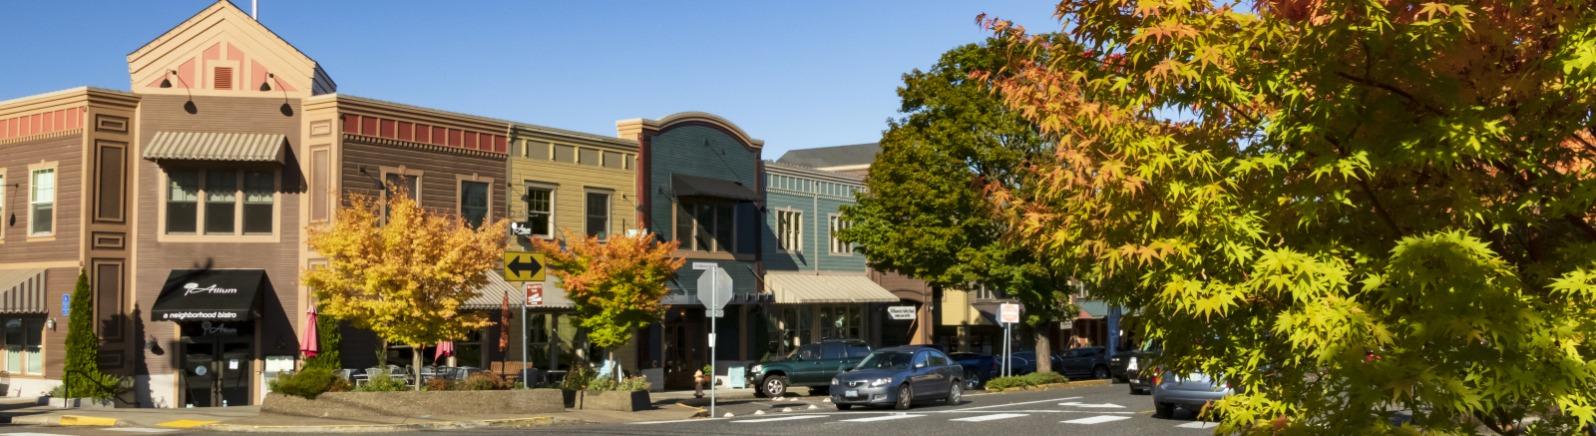 Historic West Linn Willamette District Main Street fall color